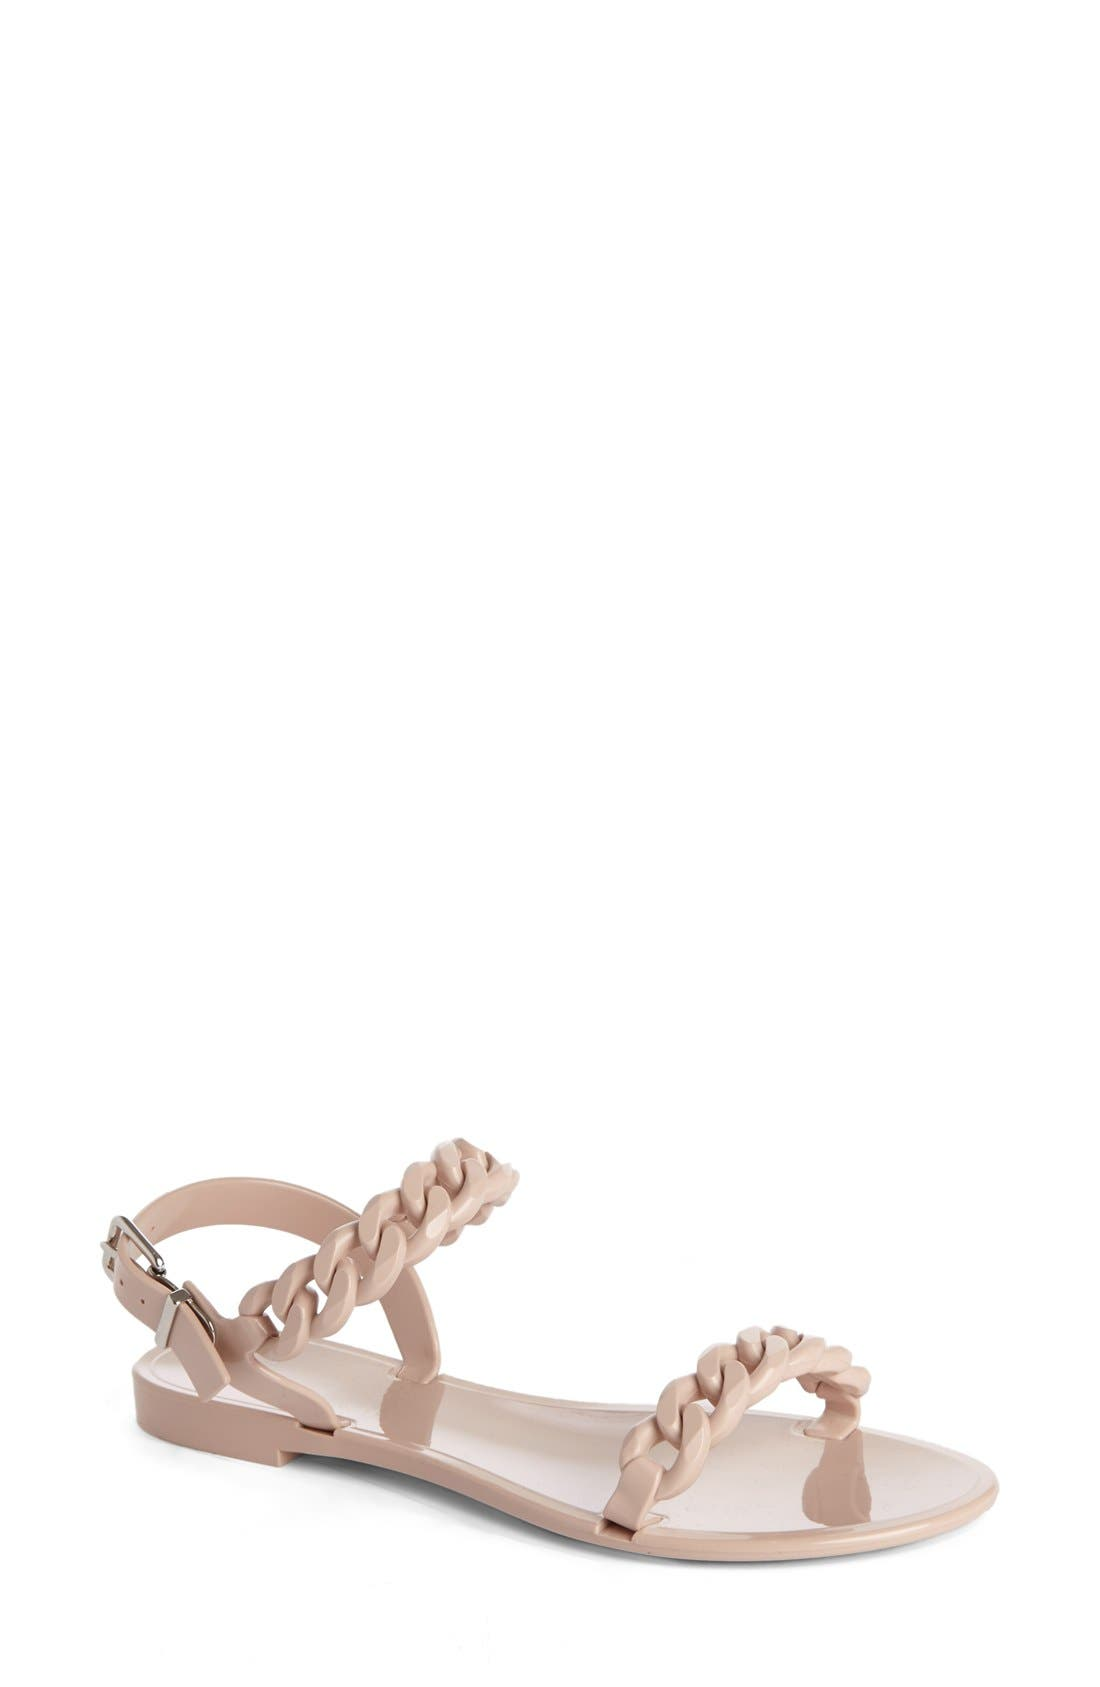 Main Image - Givenchy'NeaChain' Logo Jelly Sandal (Women)